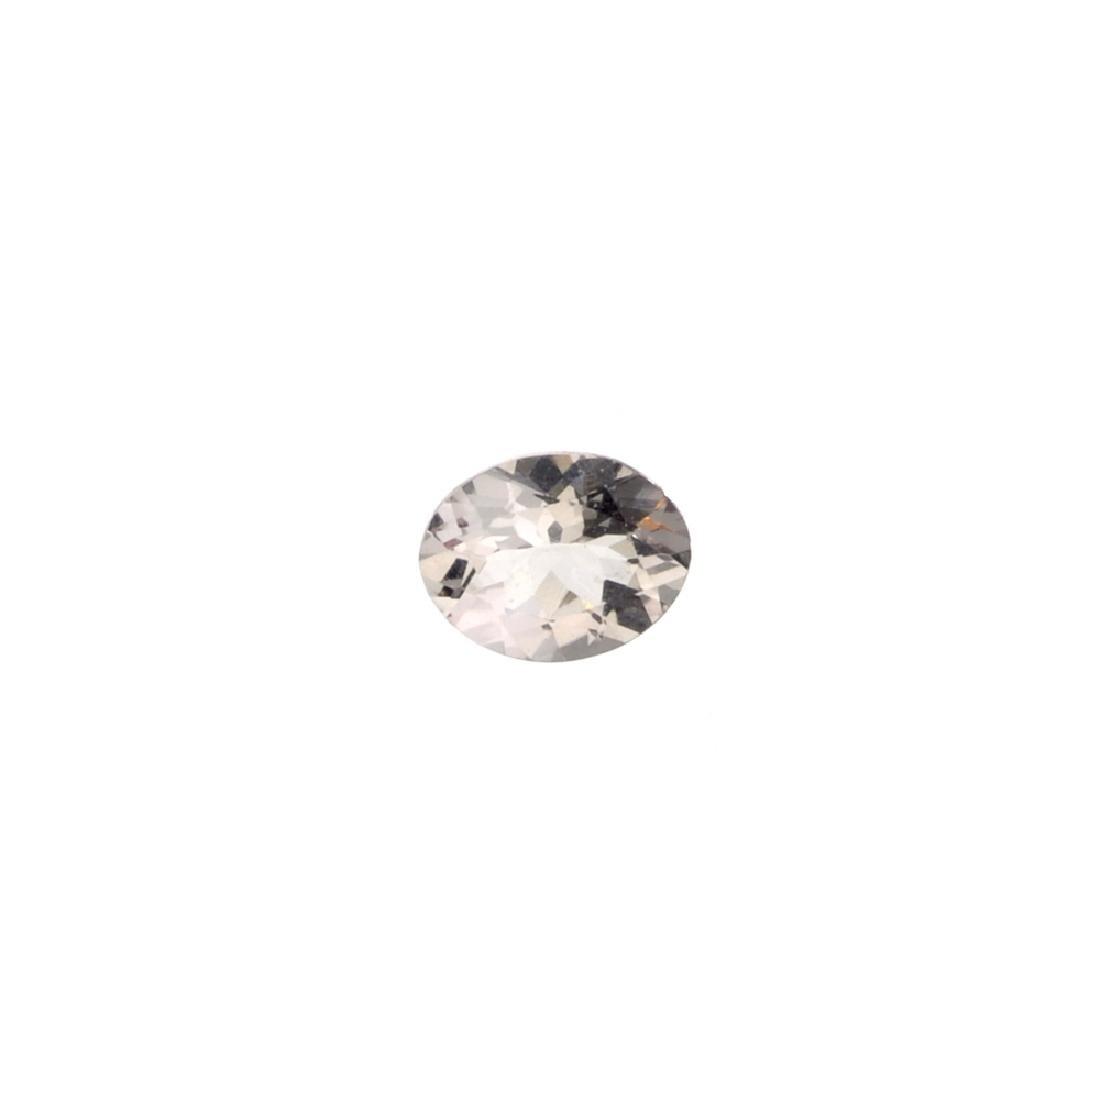 APP: 1k 1.47CT Oval Cut Morganite Gemstone